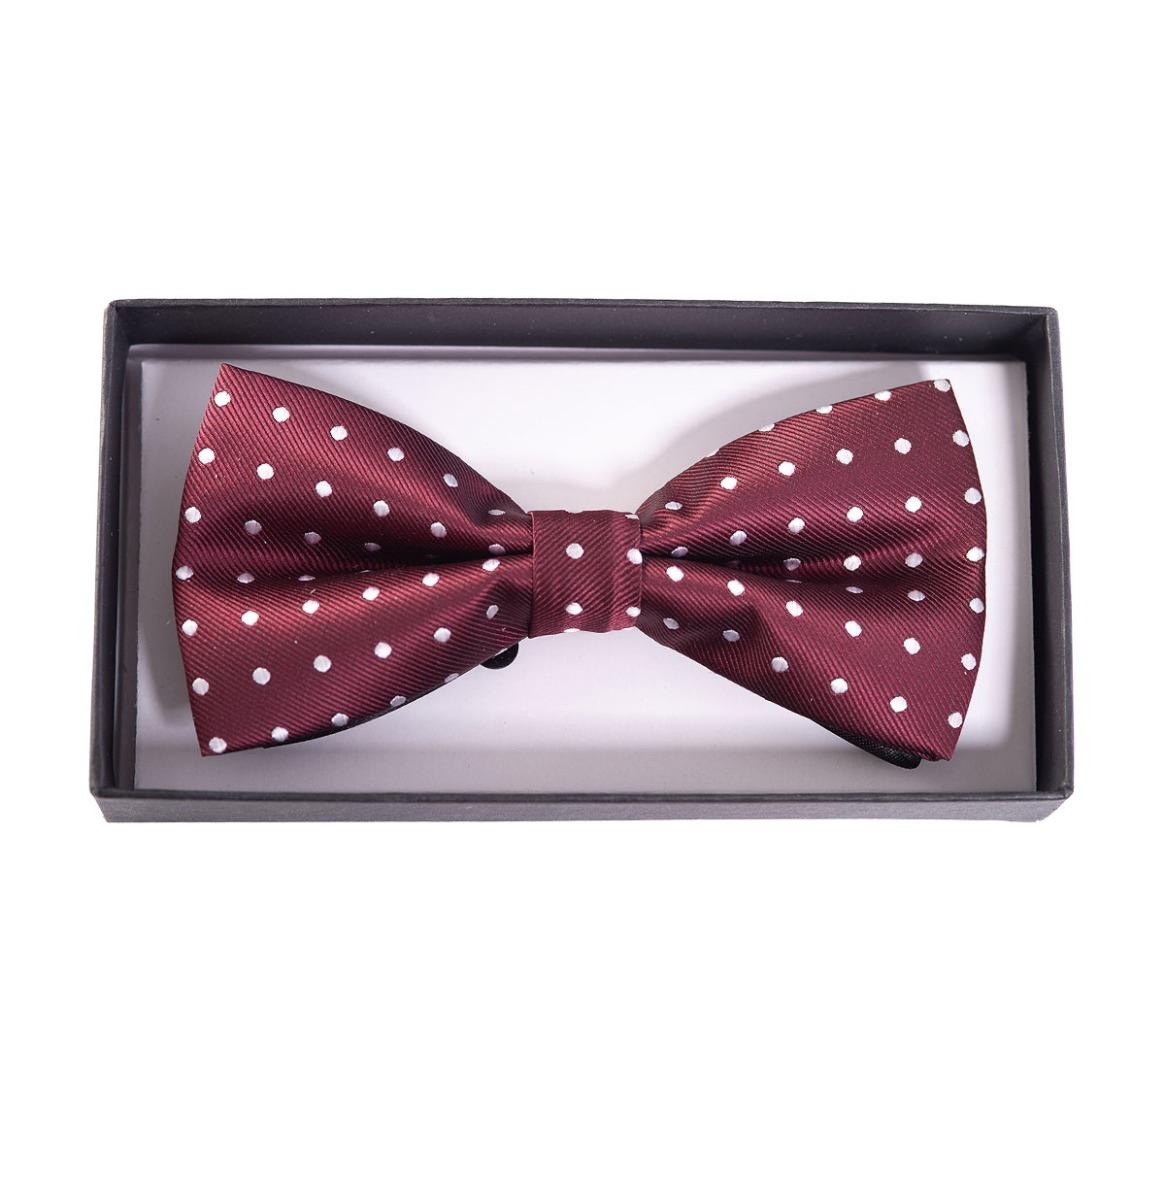 Ribbon Dance Bow Tie Burgundy White Polka Dots